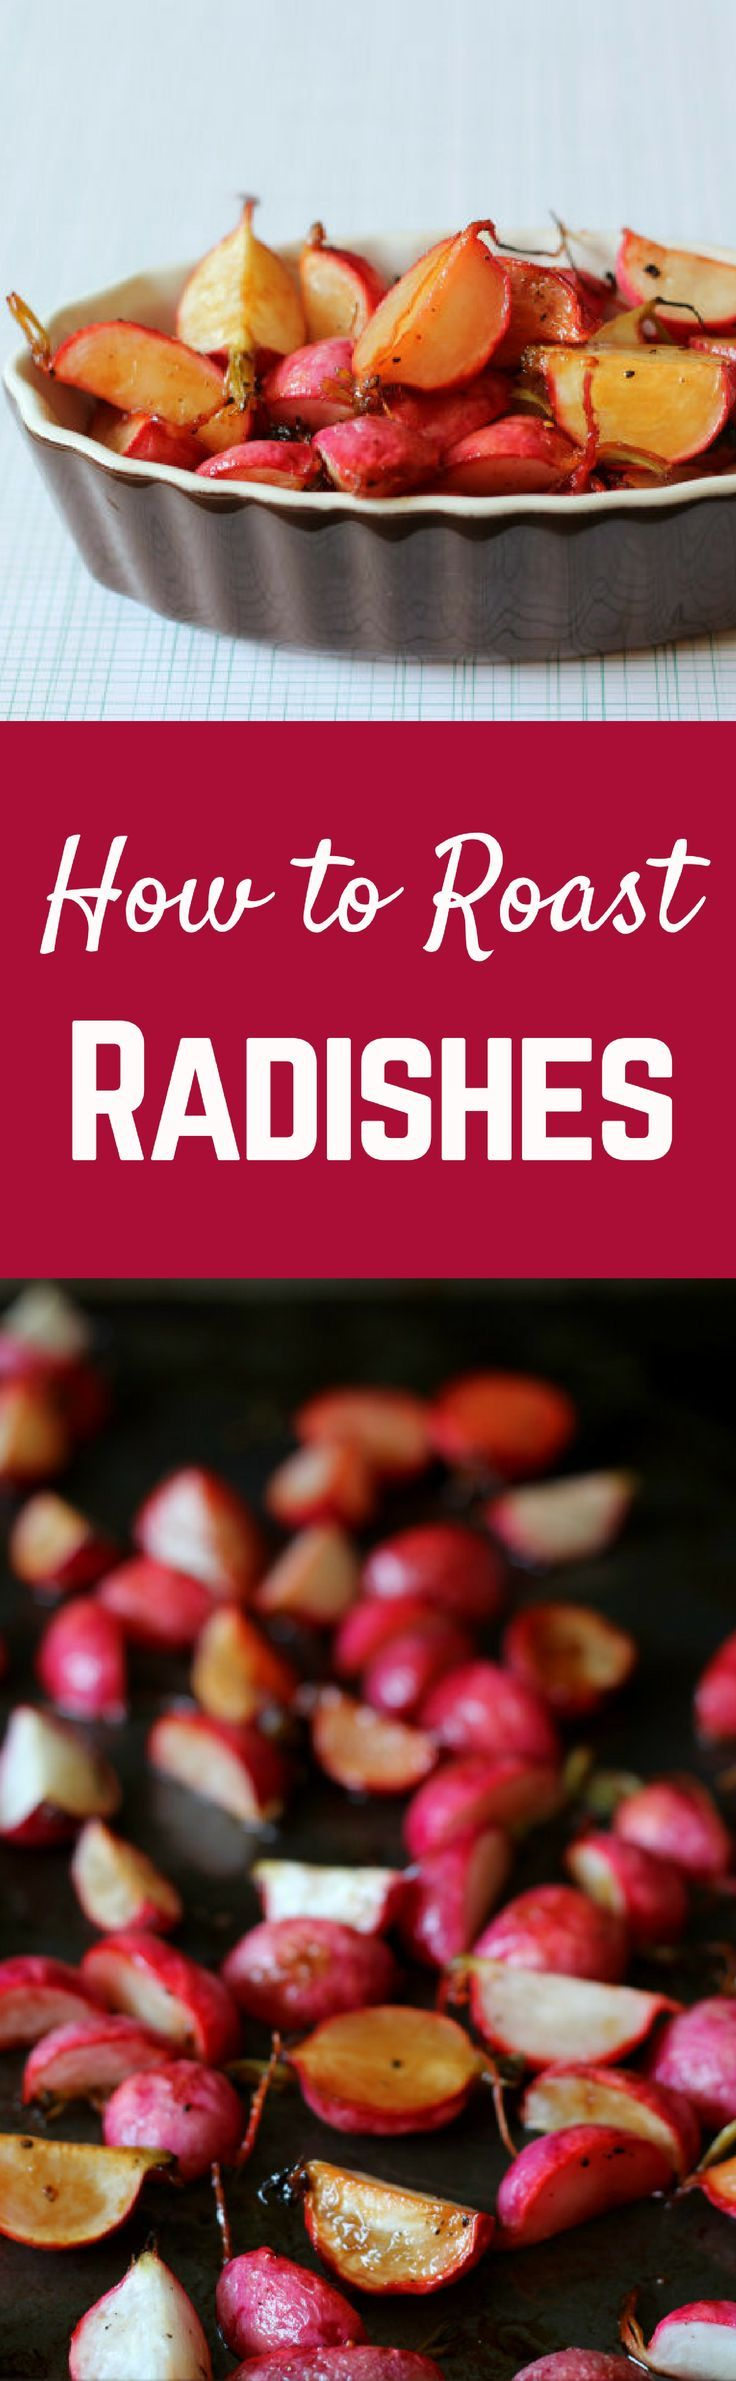 How to Roast Radishes on http://RachelCooks.com